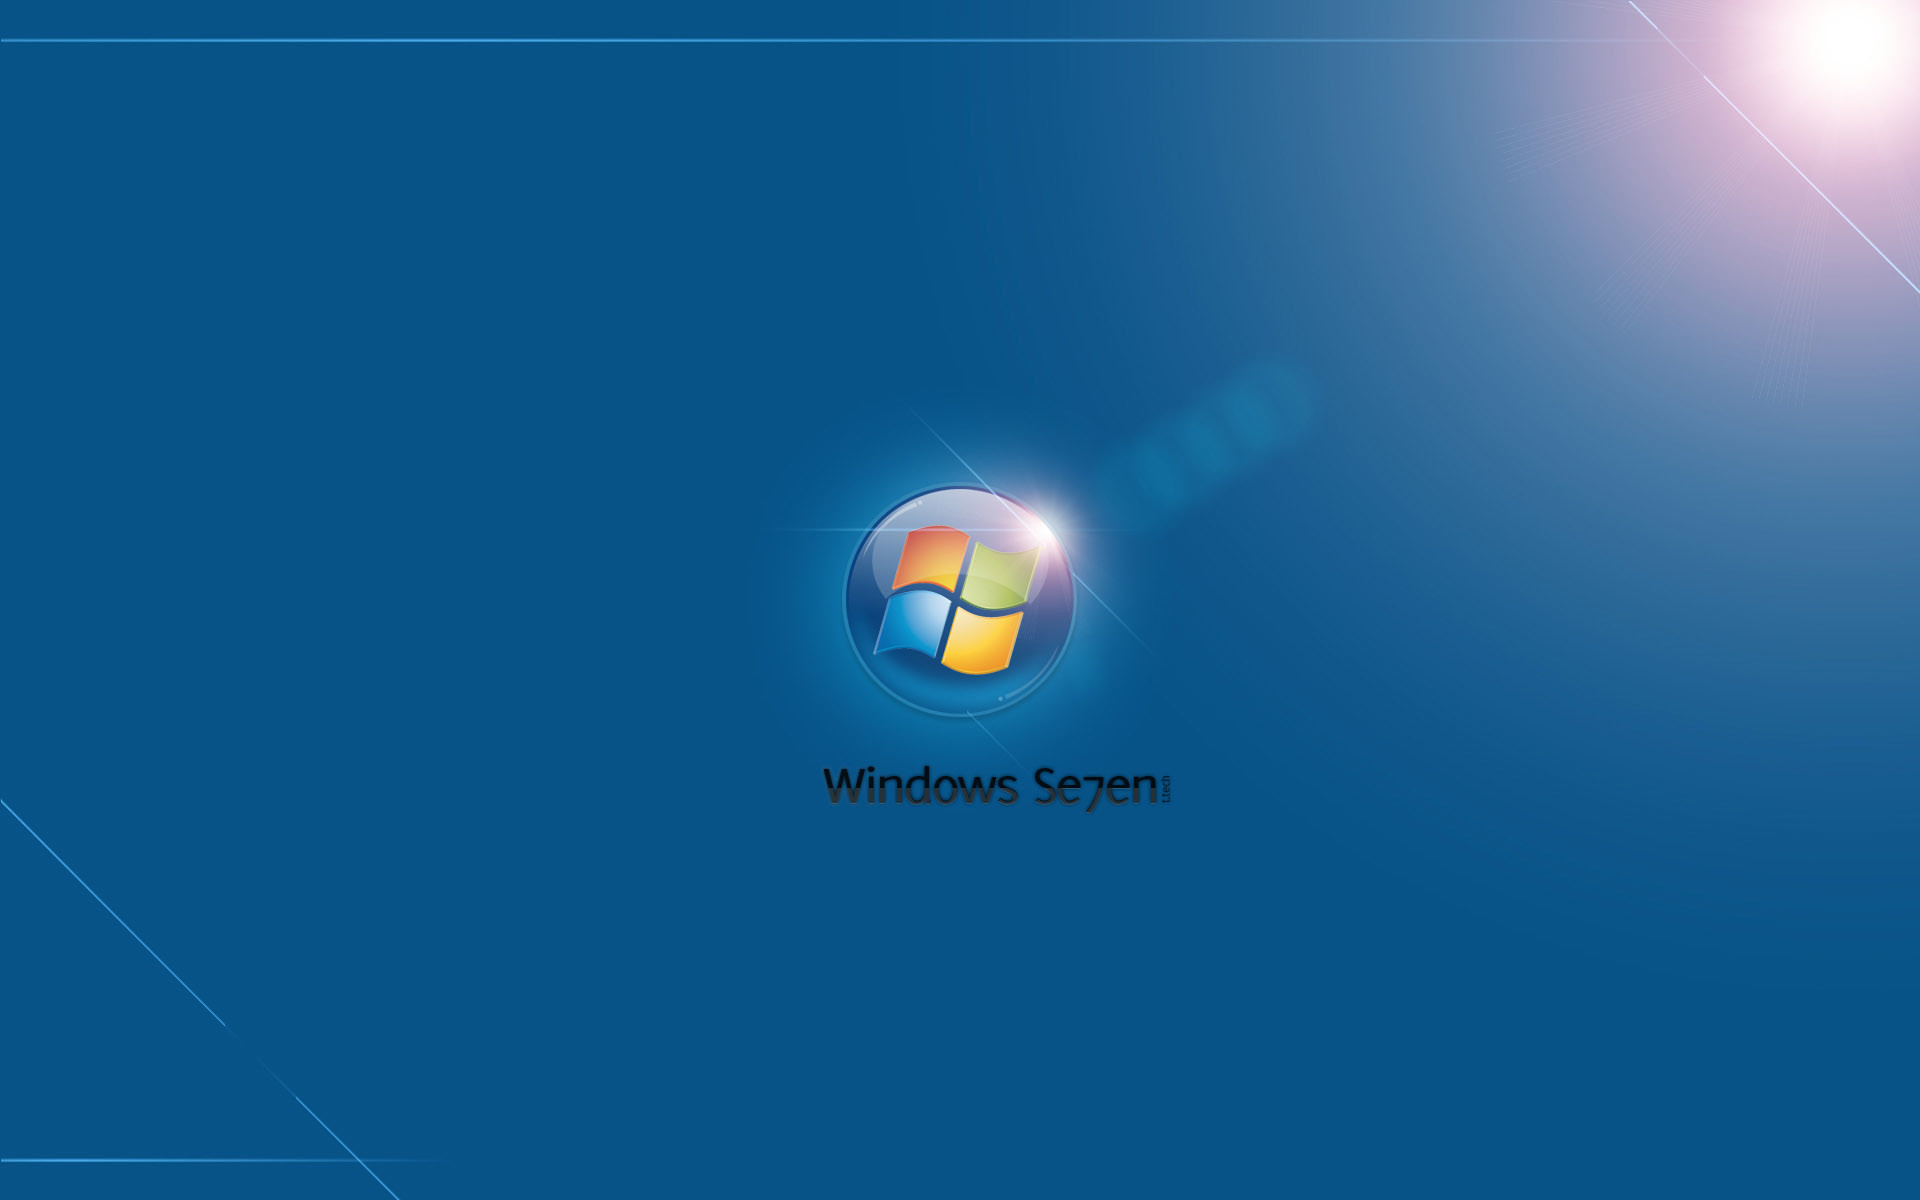 Animated Desktop Wallpaper For Windows Wallpaper Widescreen